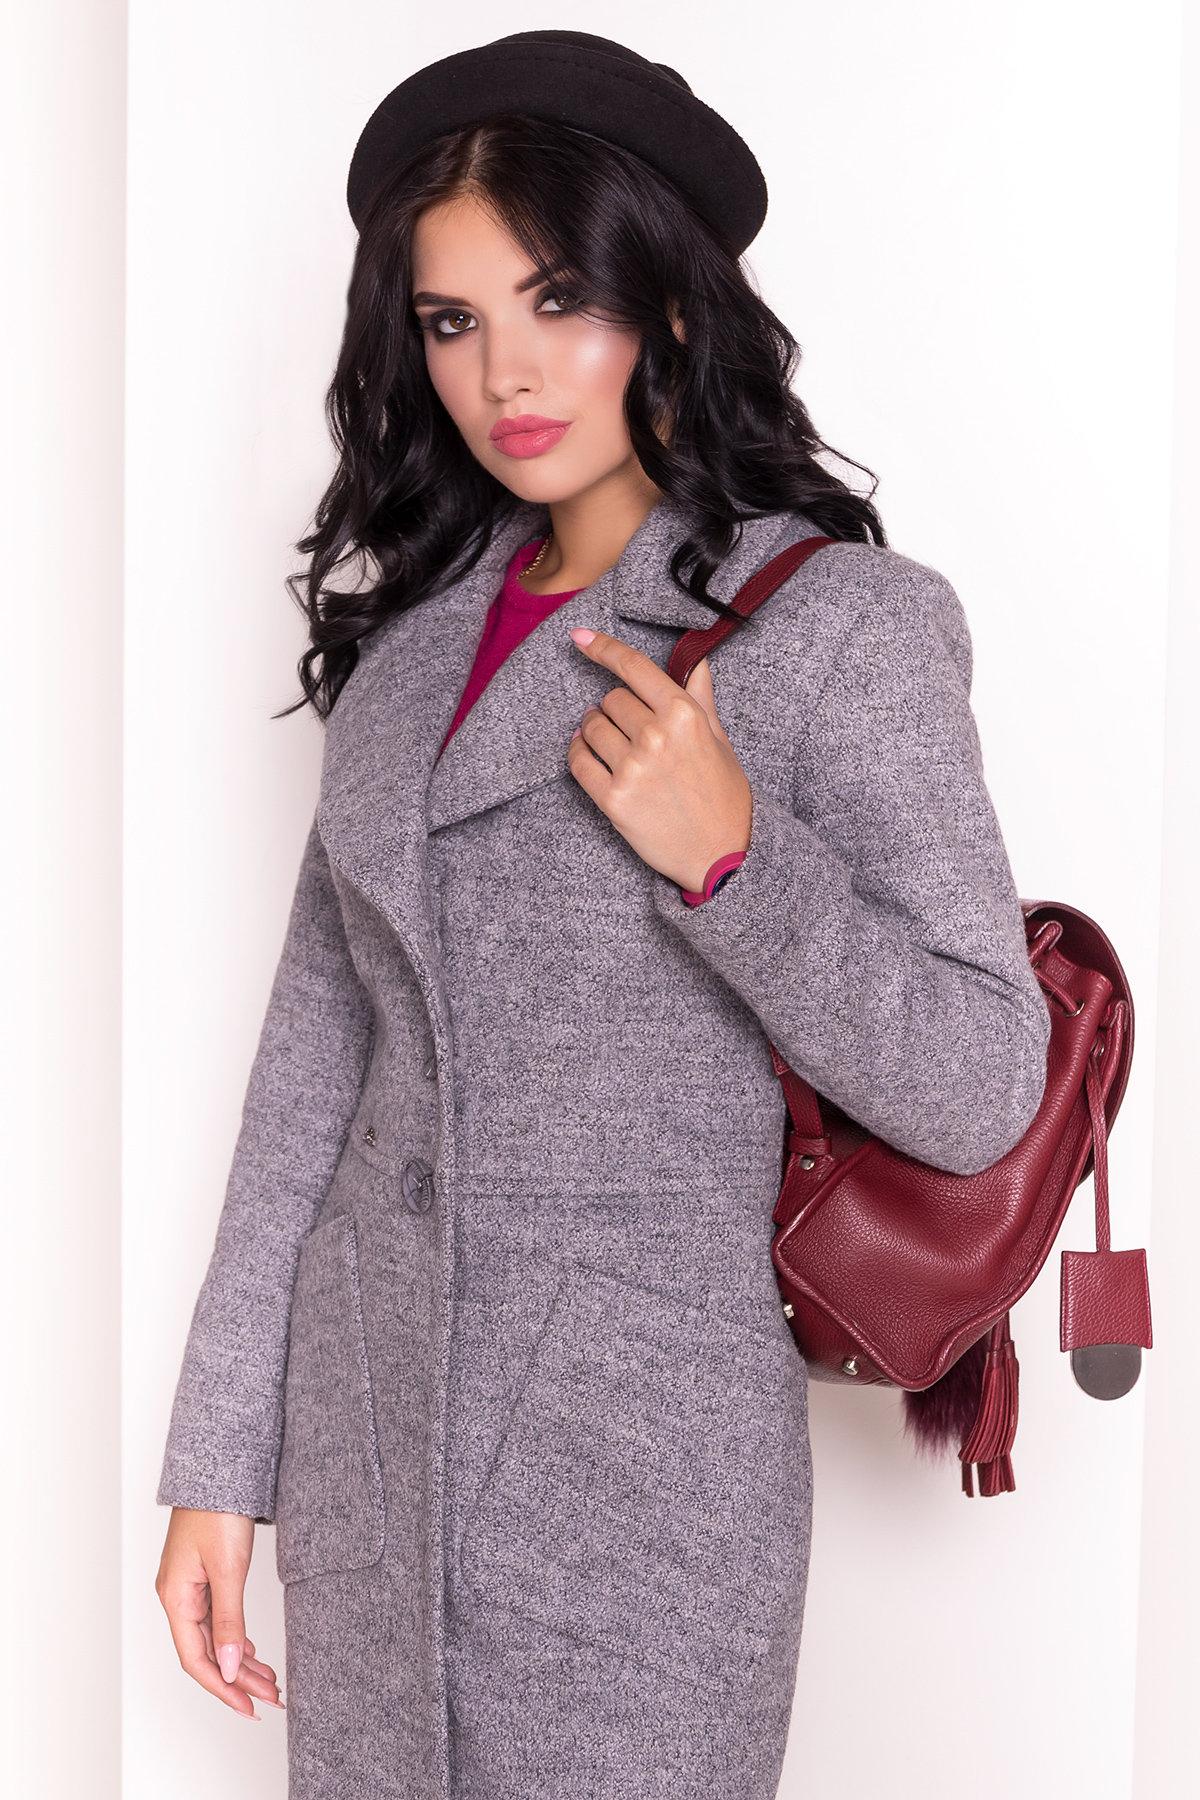 Пальто Габриэлла 3293 АРТ. 16800 Цвет: Серый 48 - фото 3, интернет магазин tm-modus.ru